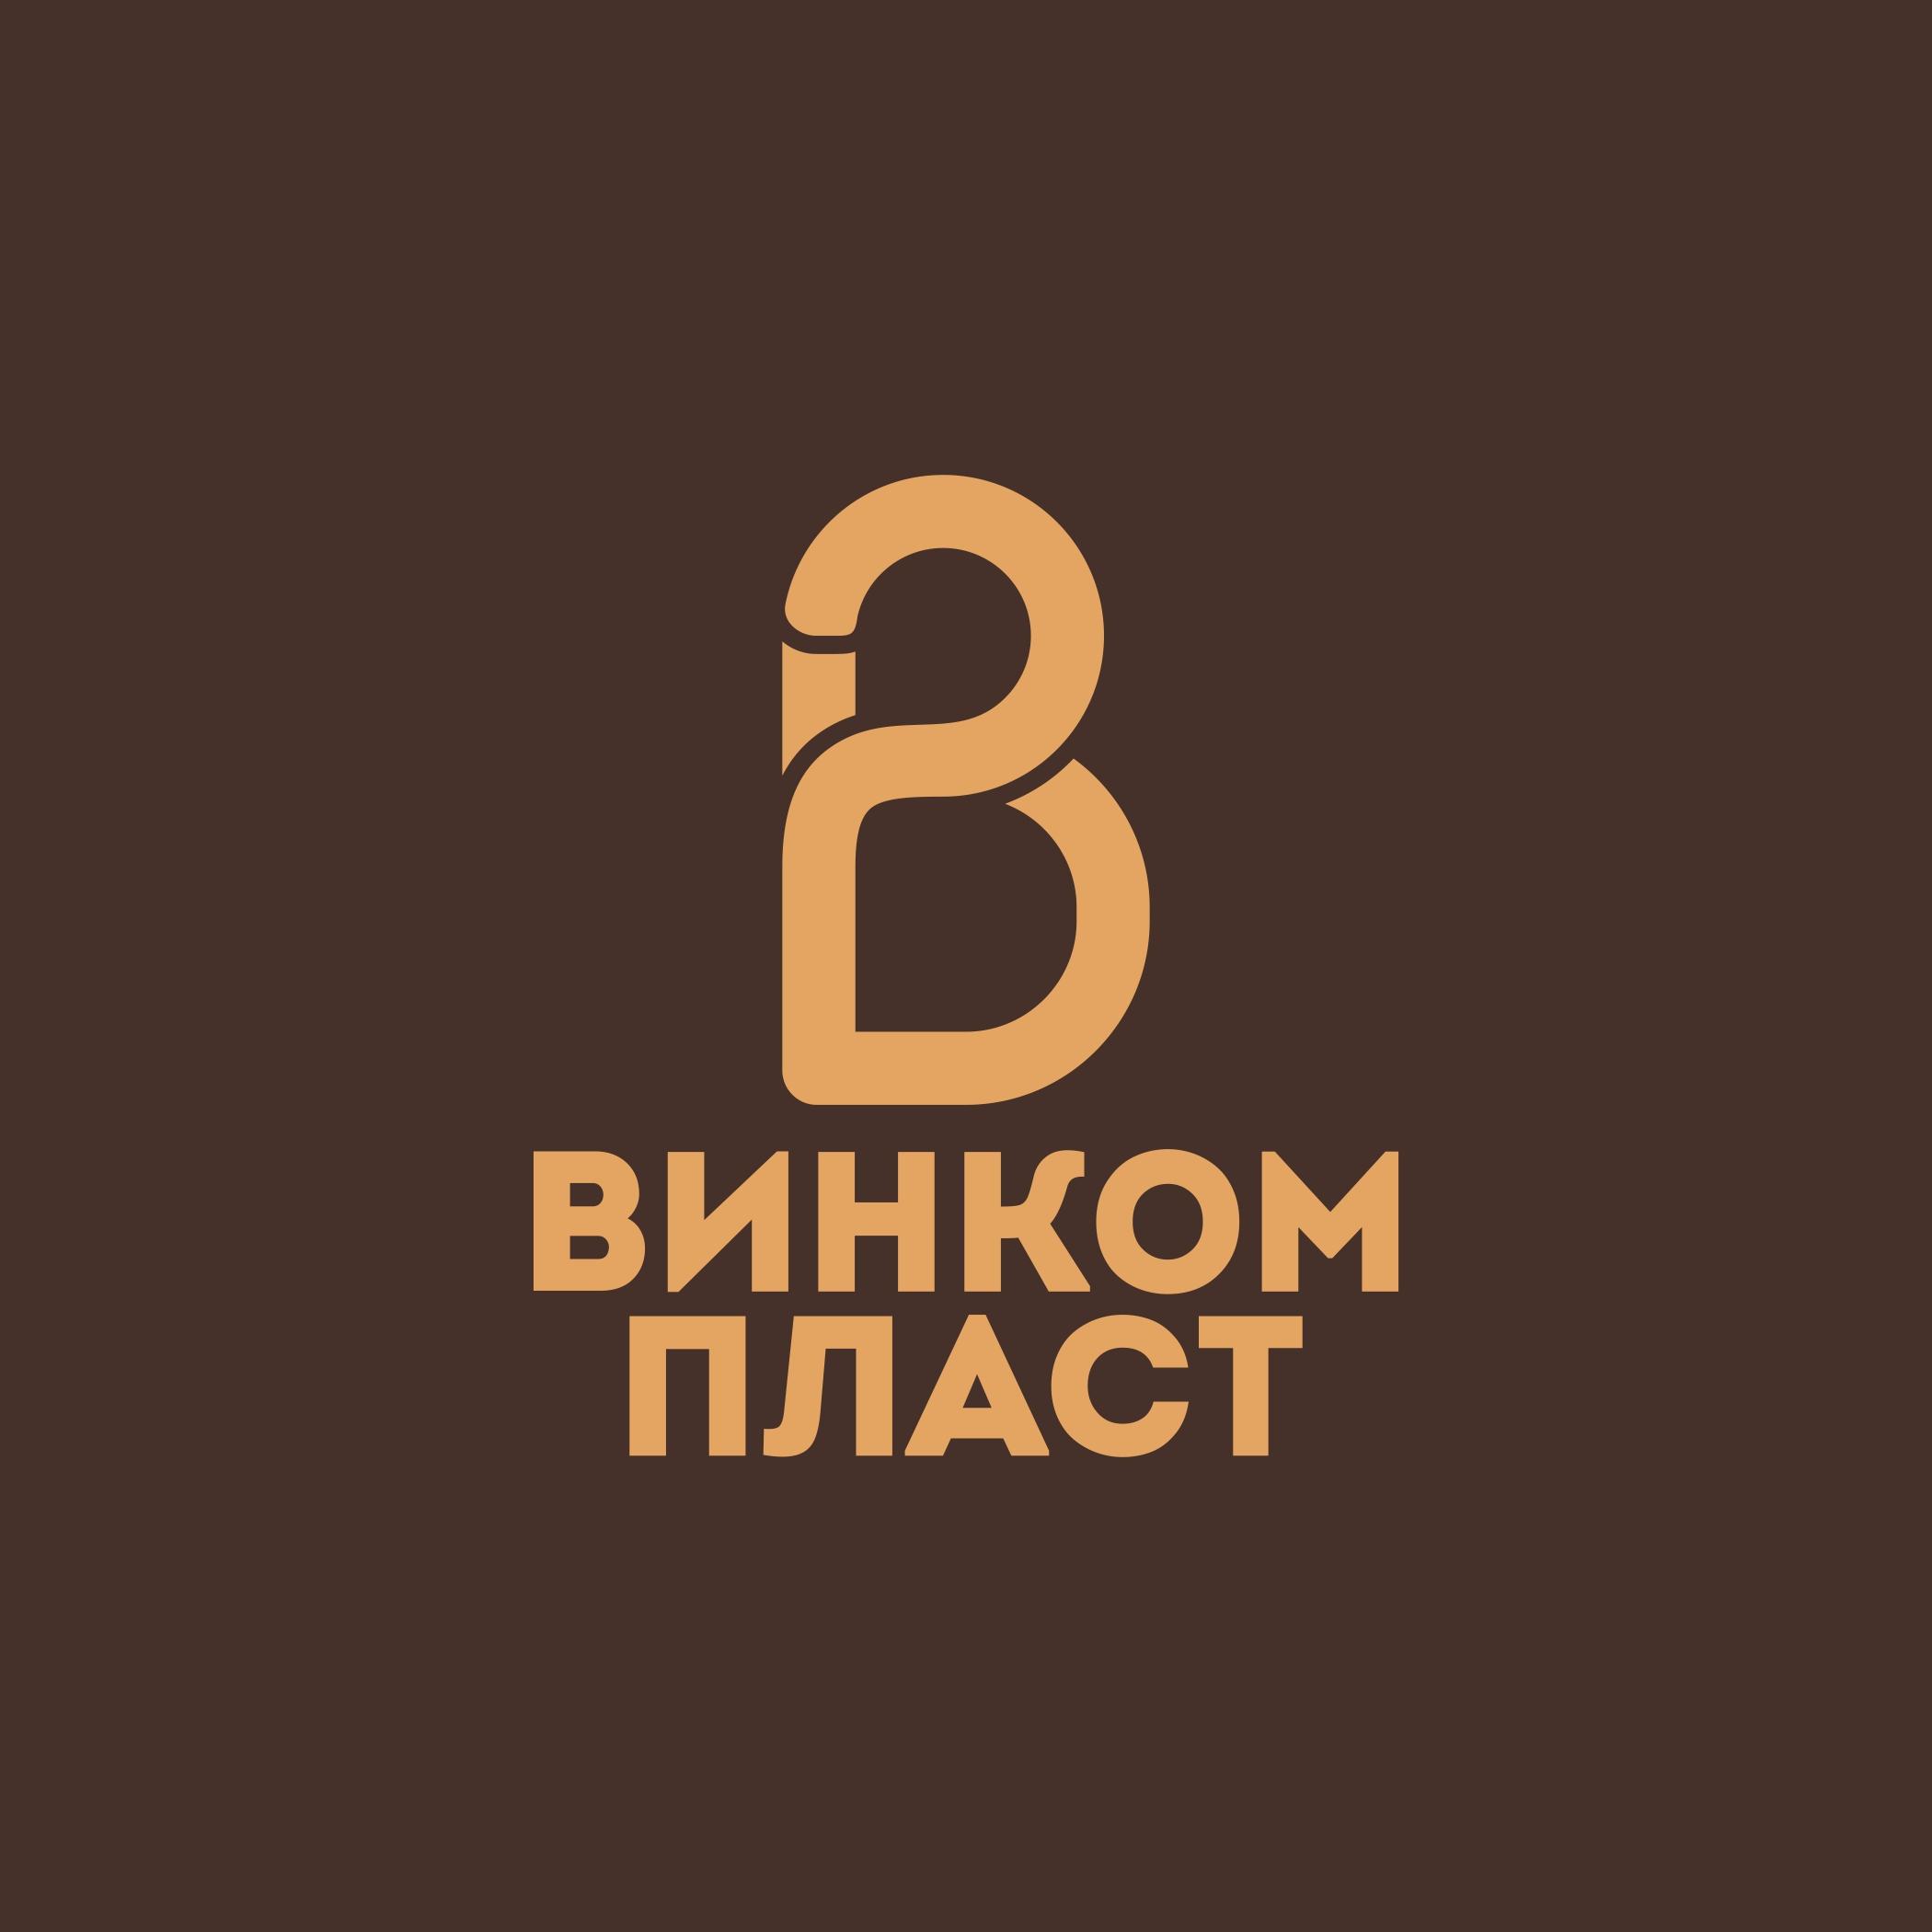 Логотип, фавикон и визитка для компании Винком Пласт  фото f_1375c458e8b9e6a2.jpg